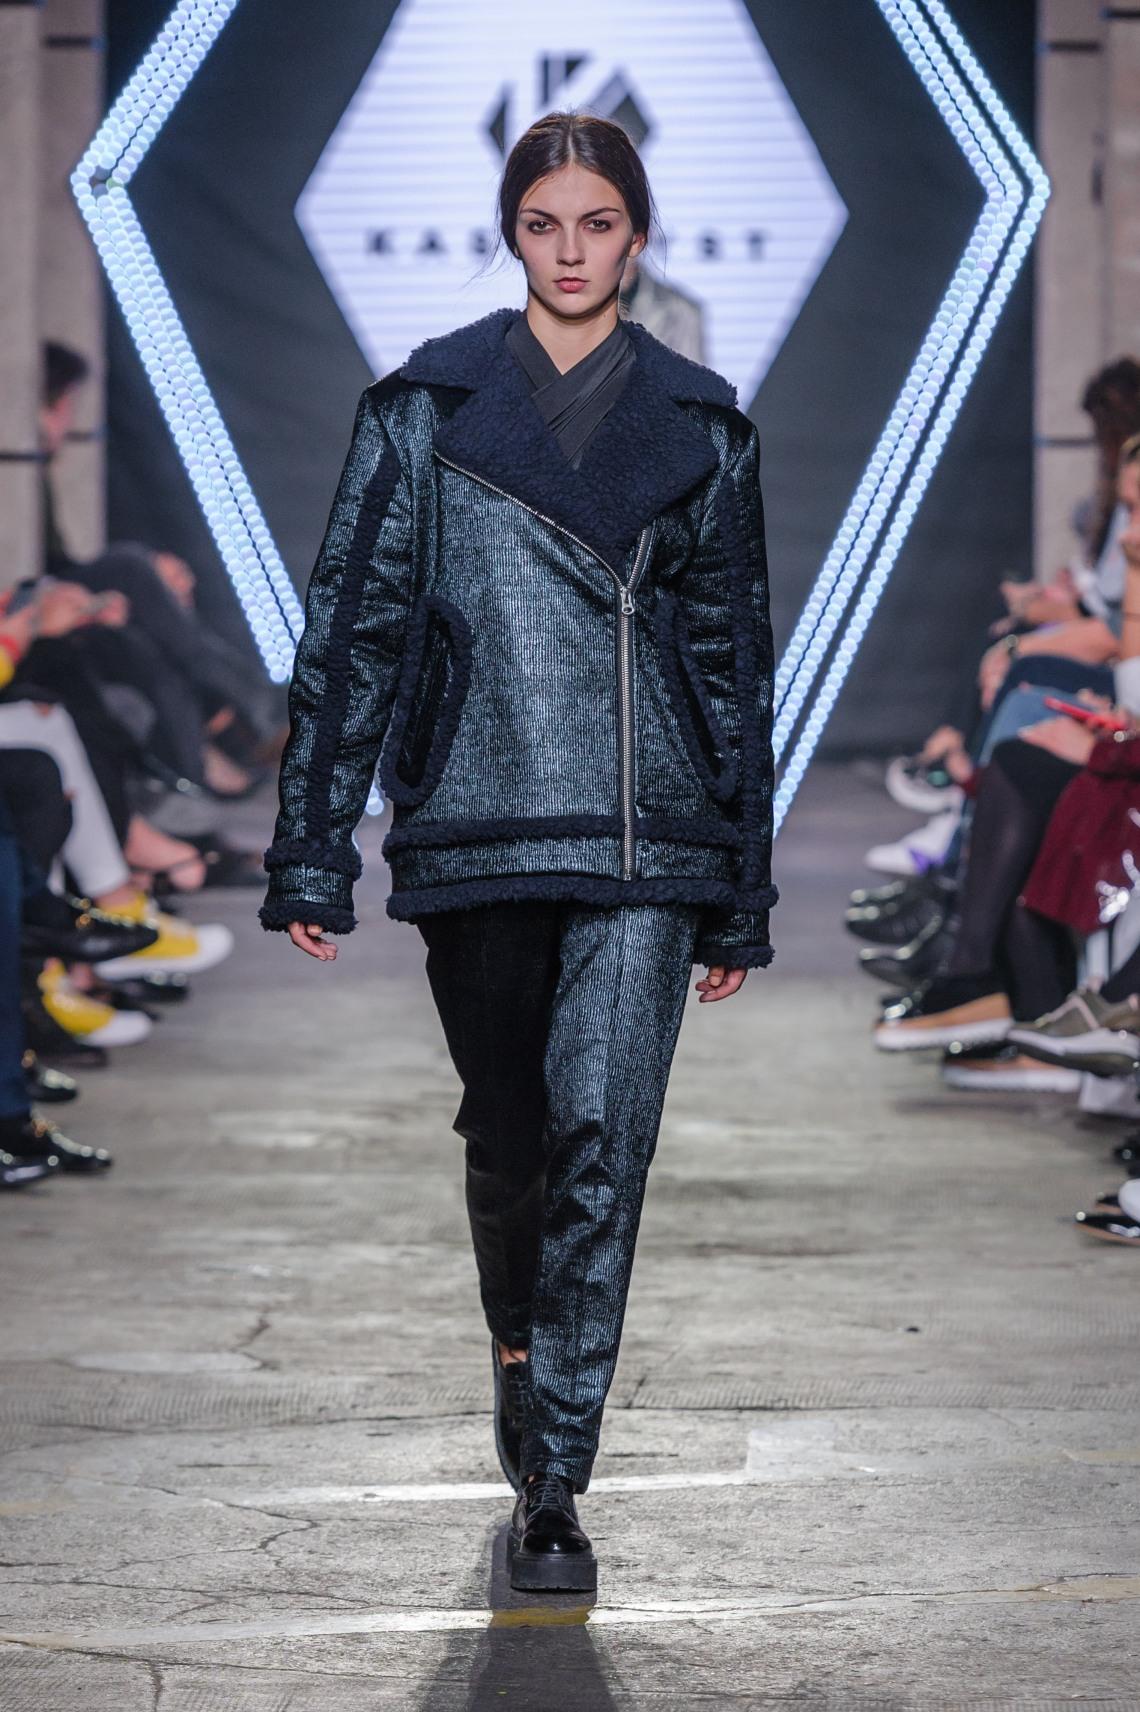 3ktw-101118_15-kaskryst_highres_fotfilipokopny-fashionimages